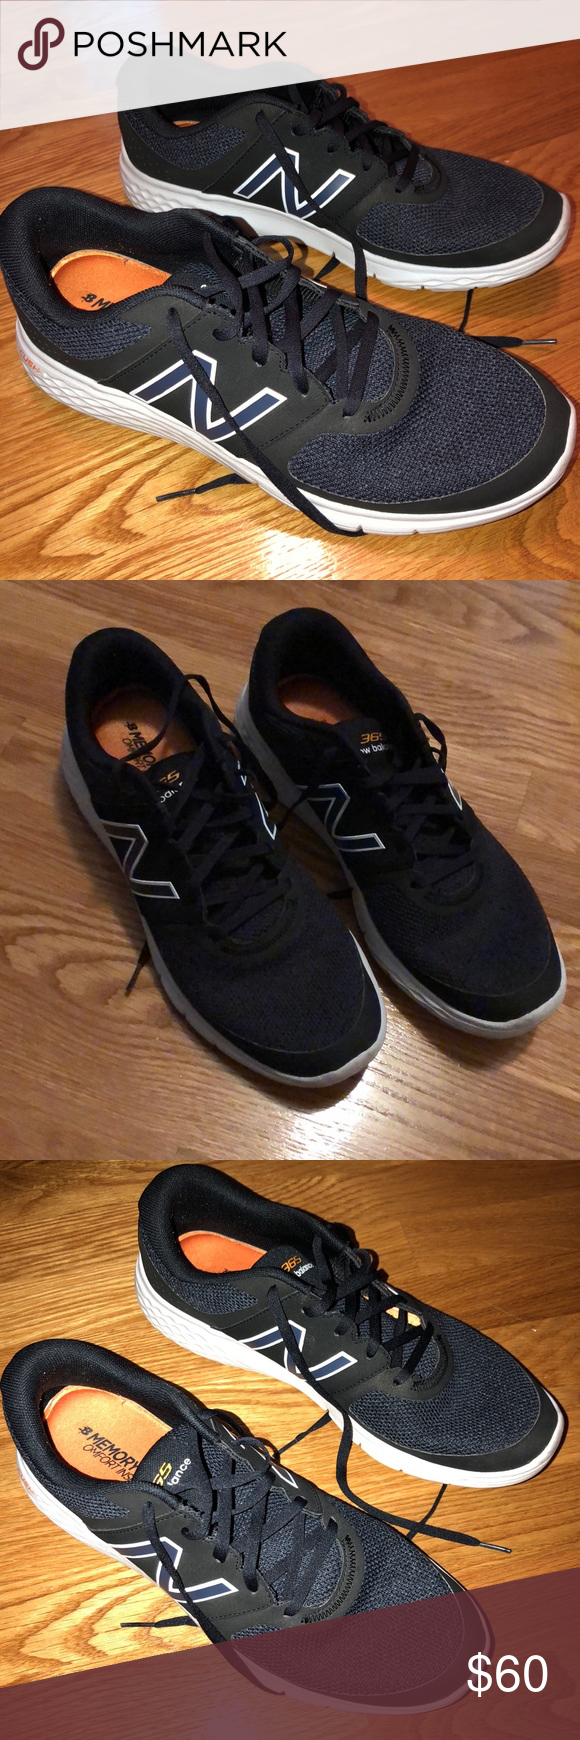 Menu0027s New Balance Crush sneakers size 115